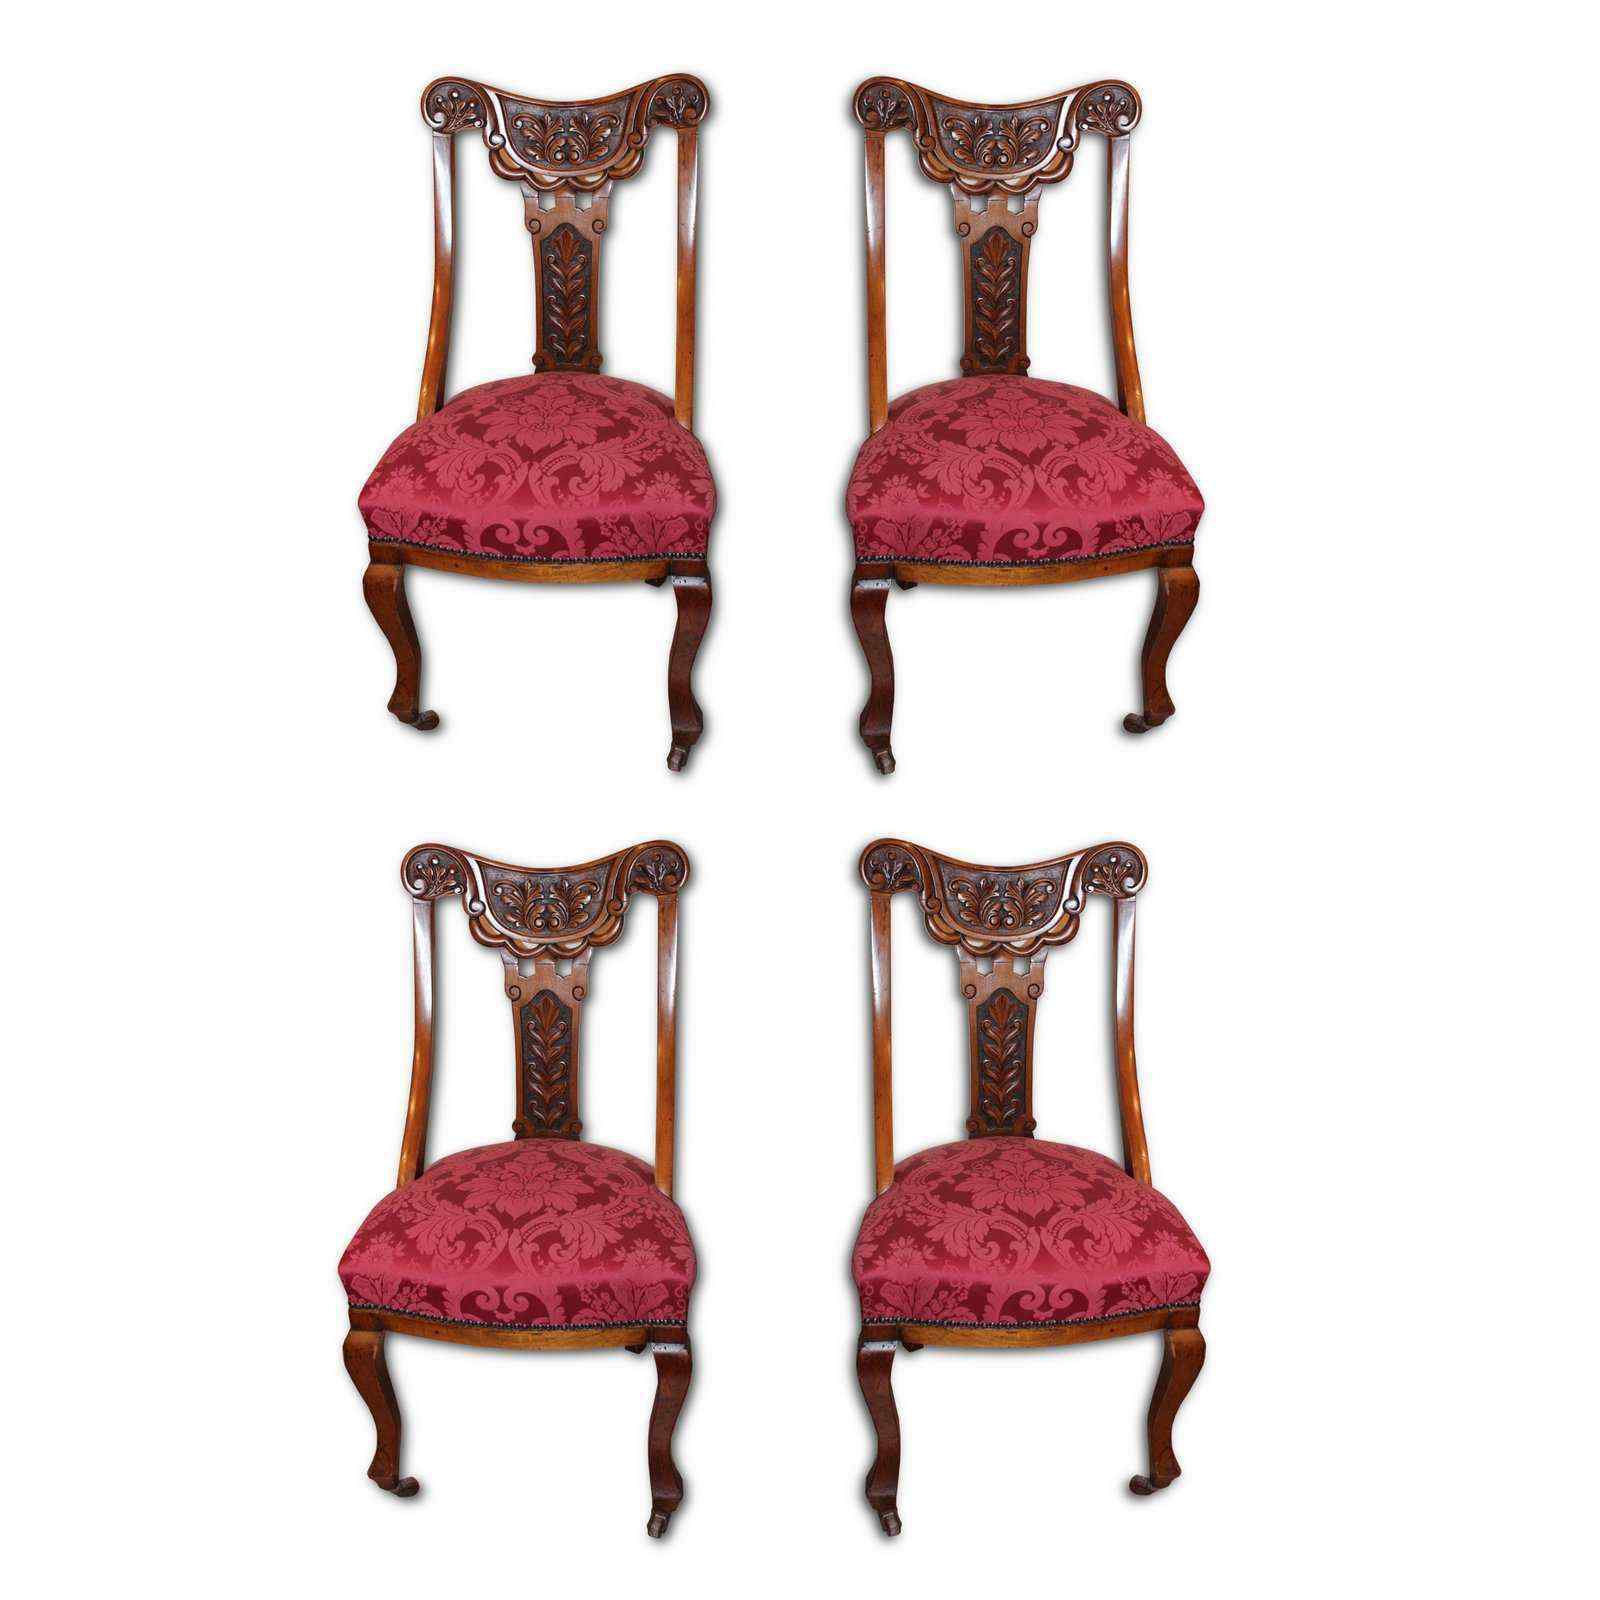 sedie antiche inglesi xix secolo